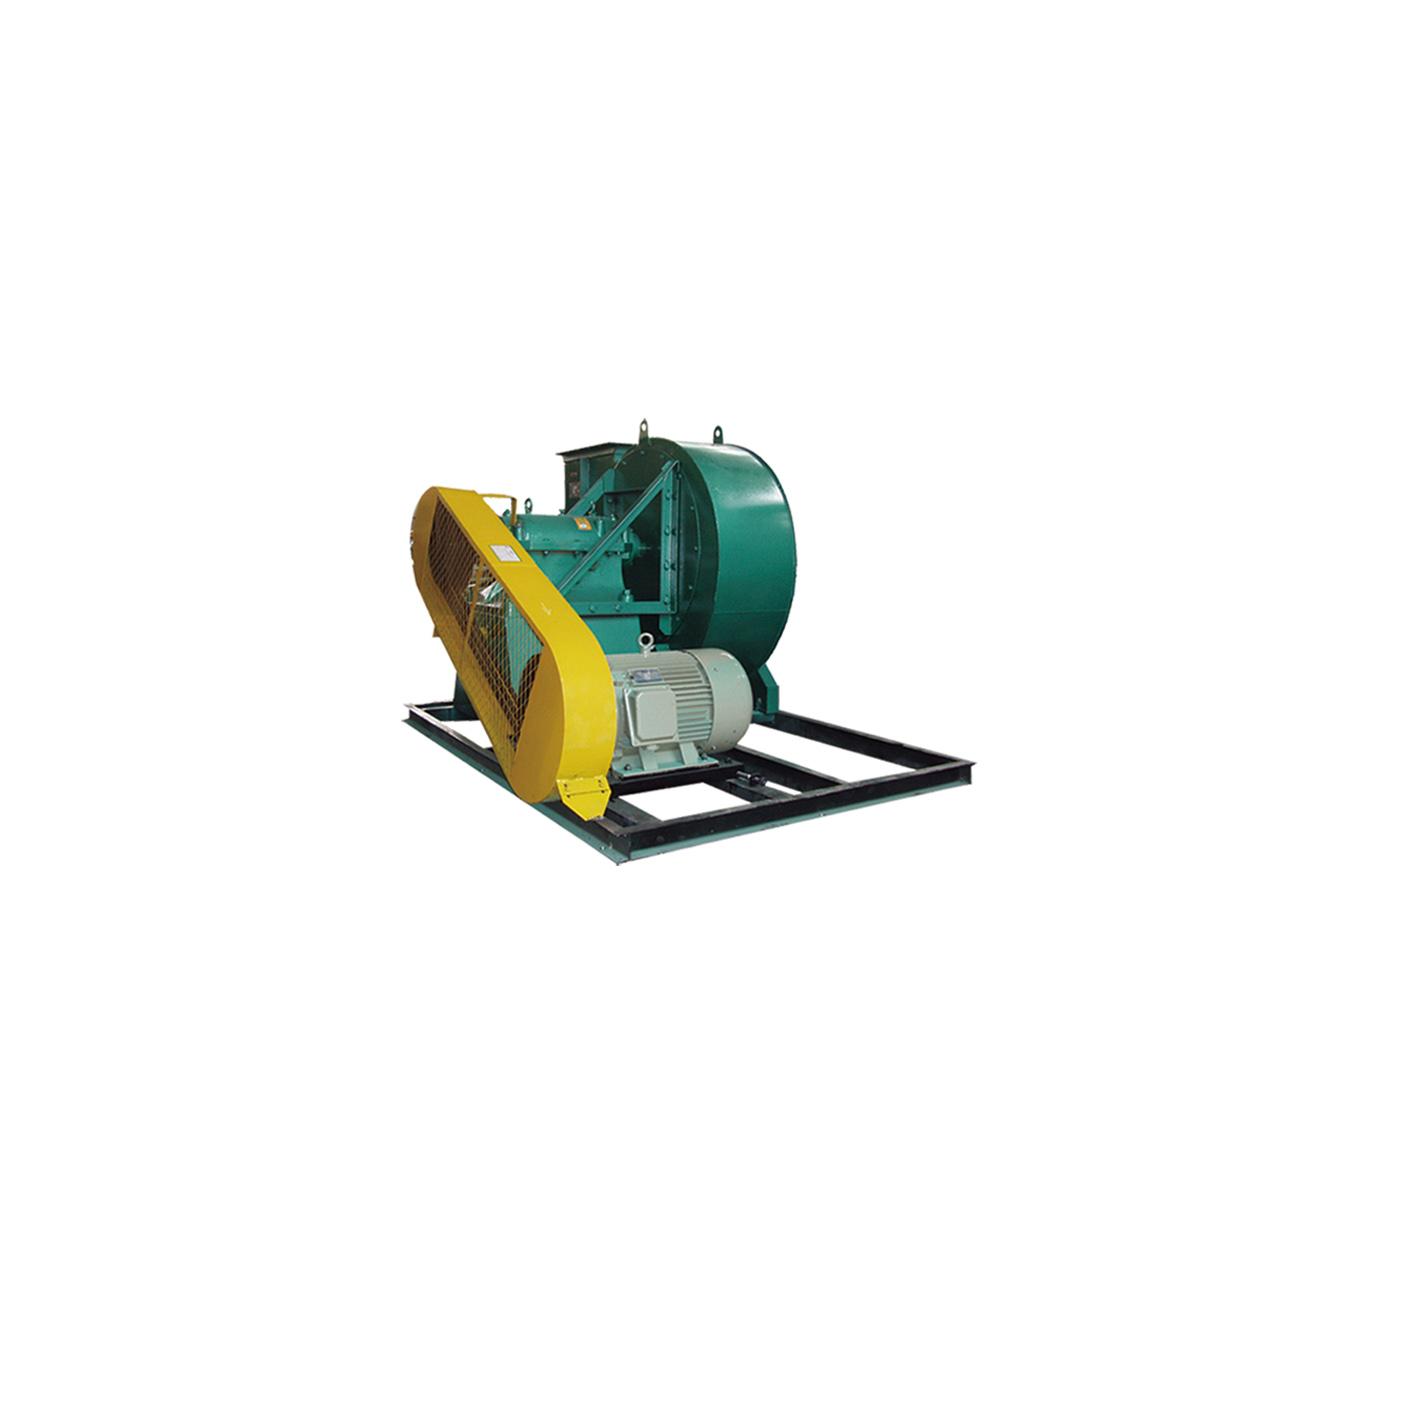 G4-68 Boiler Centrifugal Fans /Induced Draft Fan